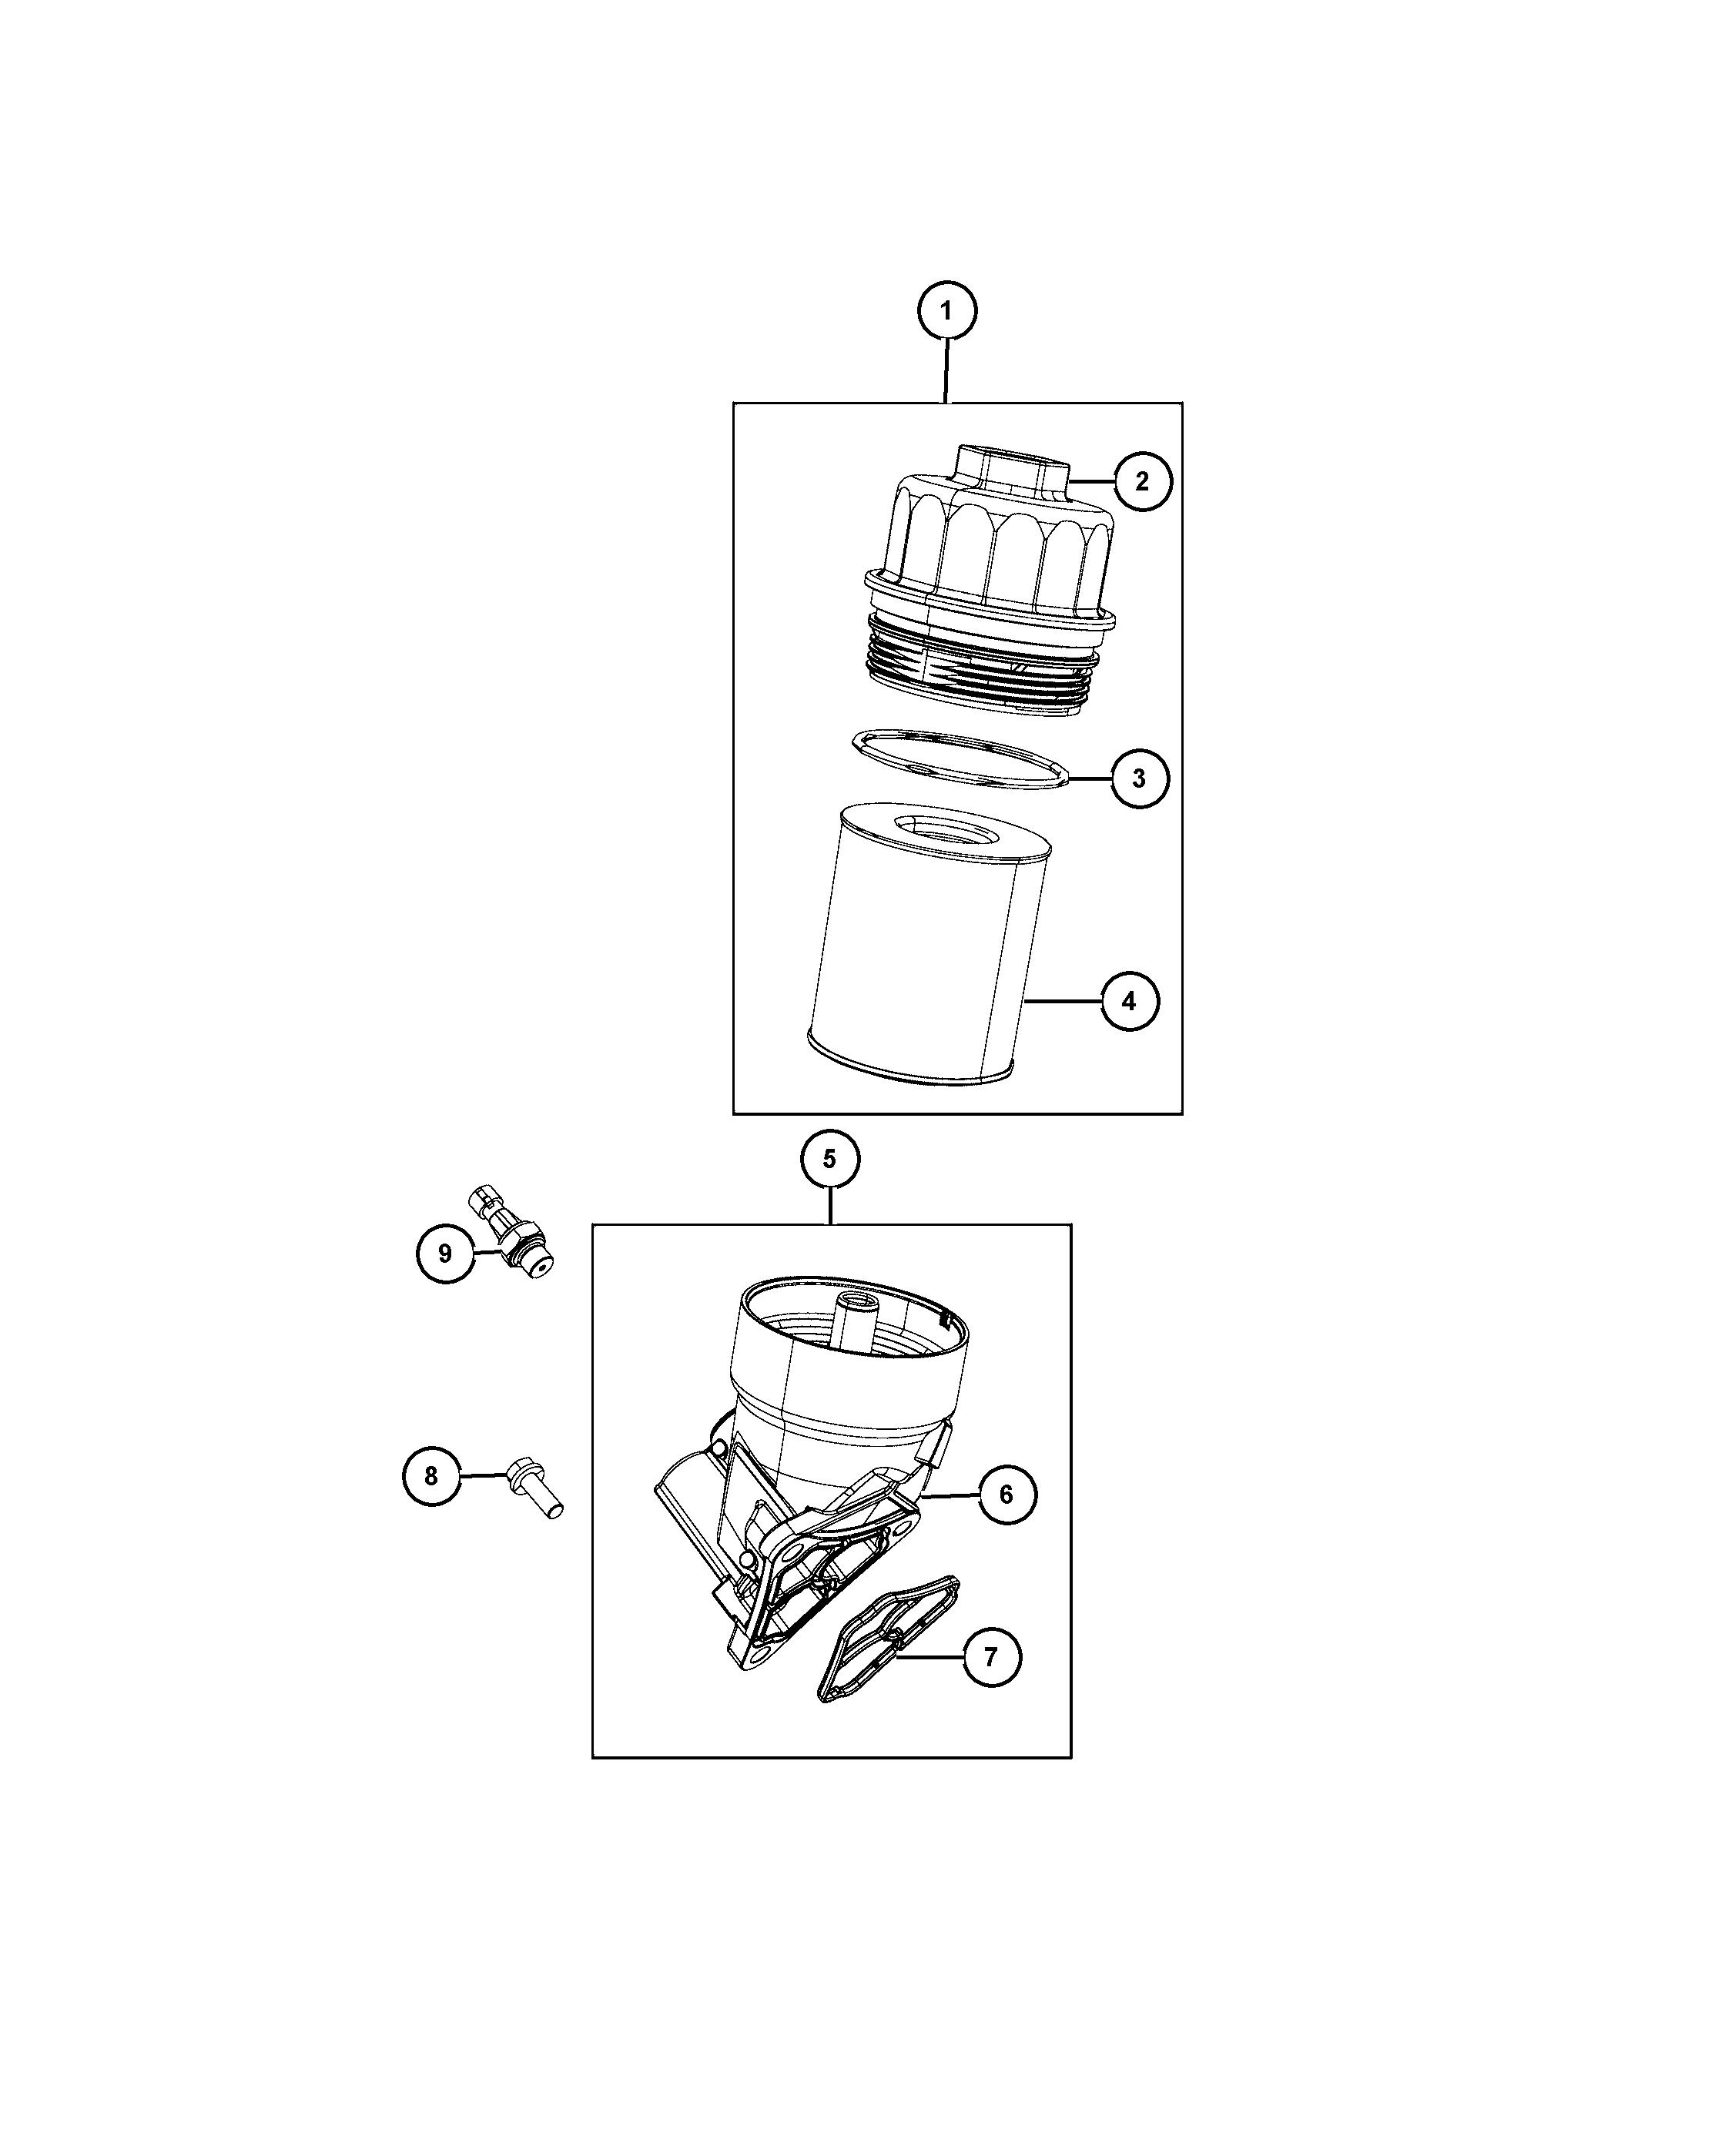 Grebest Engine Air Filter Car Interior Parts Engine Filter 2Pcs C16098 BBM4-61-J6X Car Engine Cabin Air Filter Set for Mazda3 2010-2013